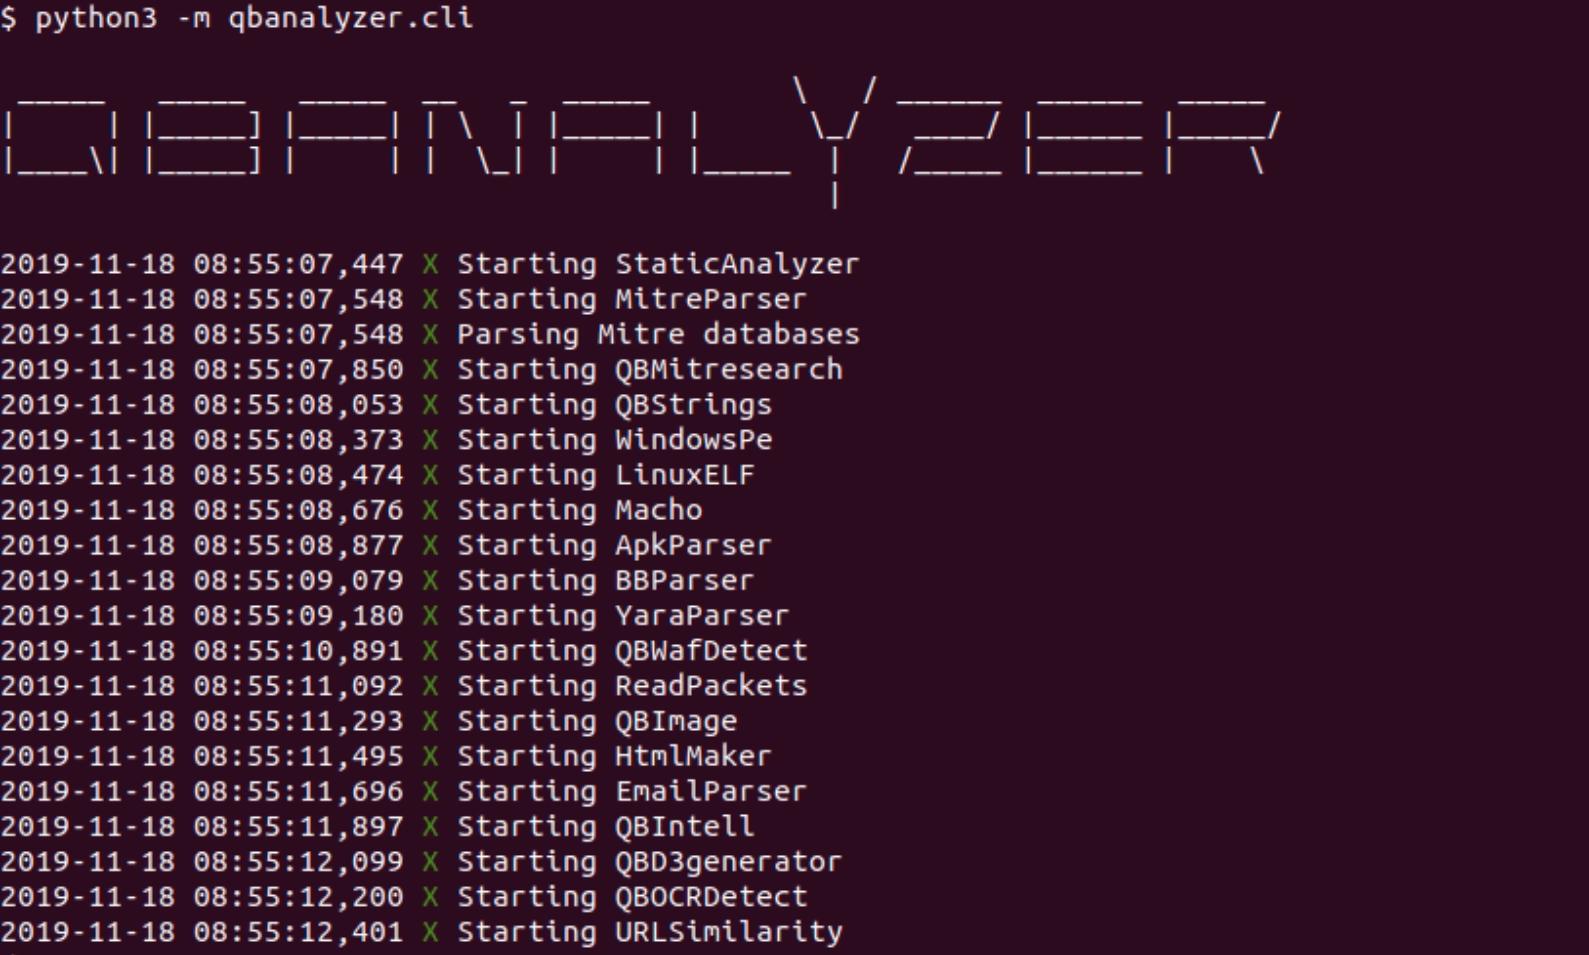 QBAnalyzer: Open source threat intelligence framework